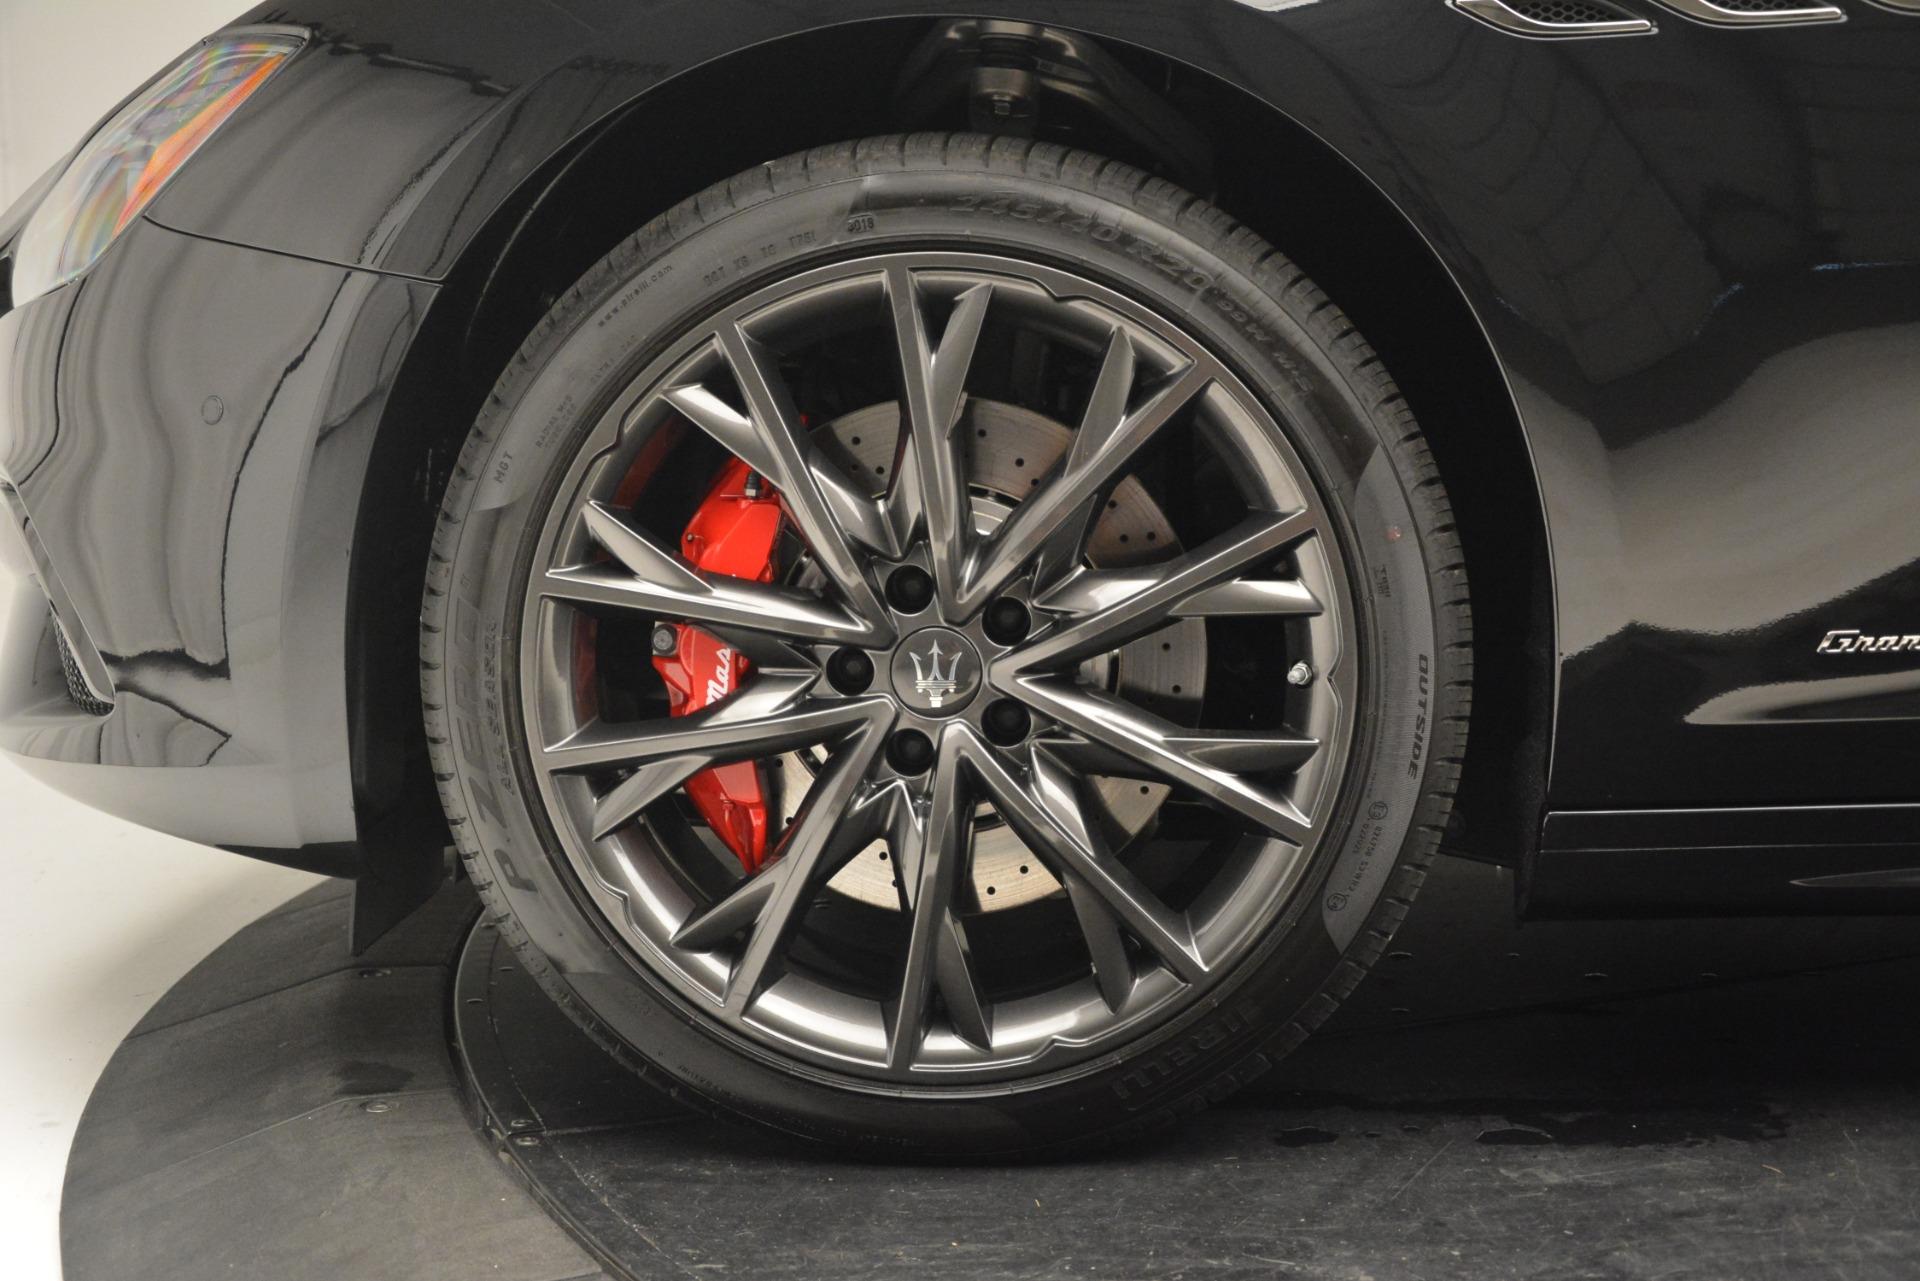 New 2019 Maserati Ghibli S Q4 GranSport For Sale In Greenwich, CT. Alfa Romeo of Greenwich, W668 2926_p38